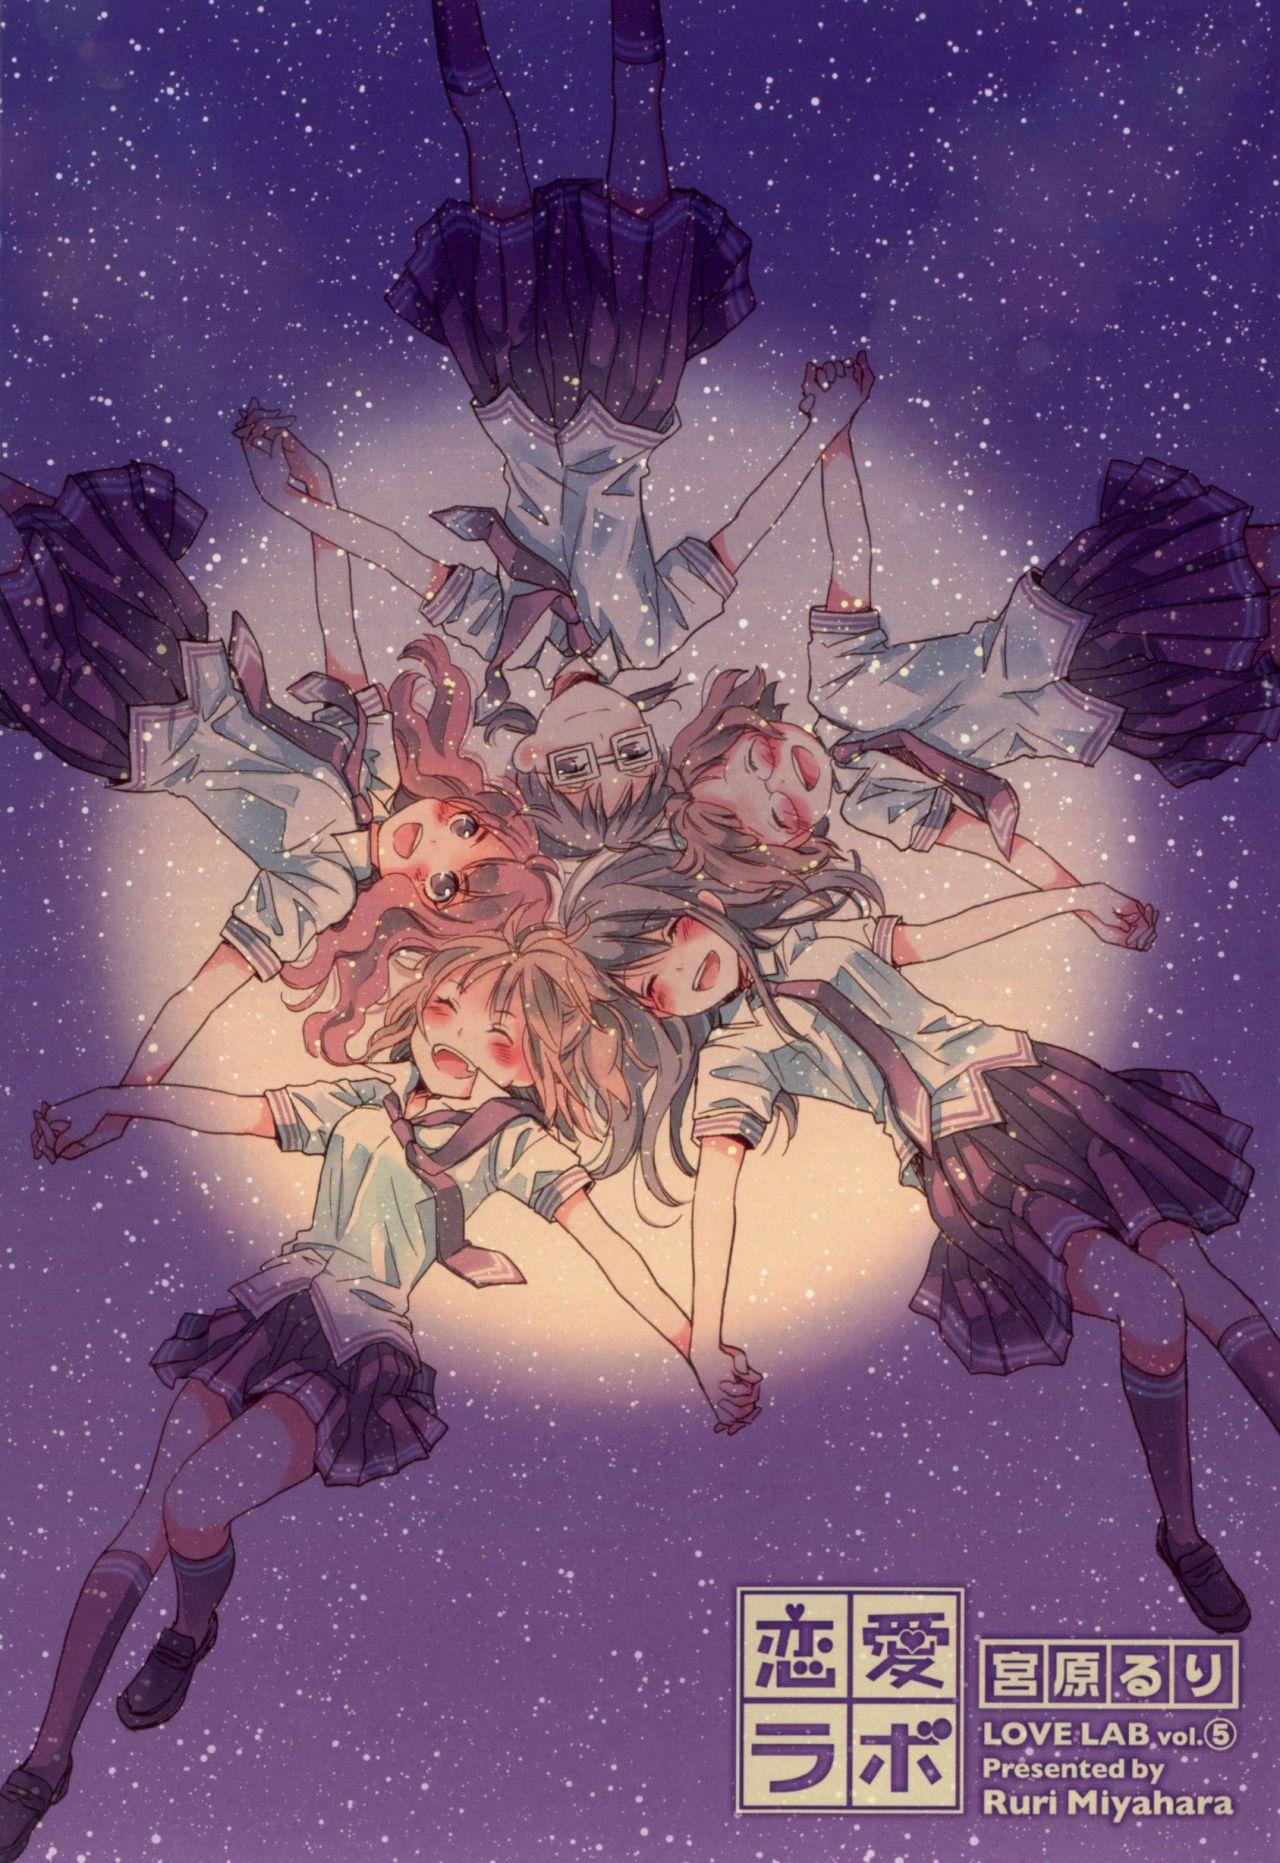 Pinterest Manga love, Manga to read, Anime images